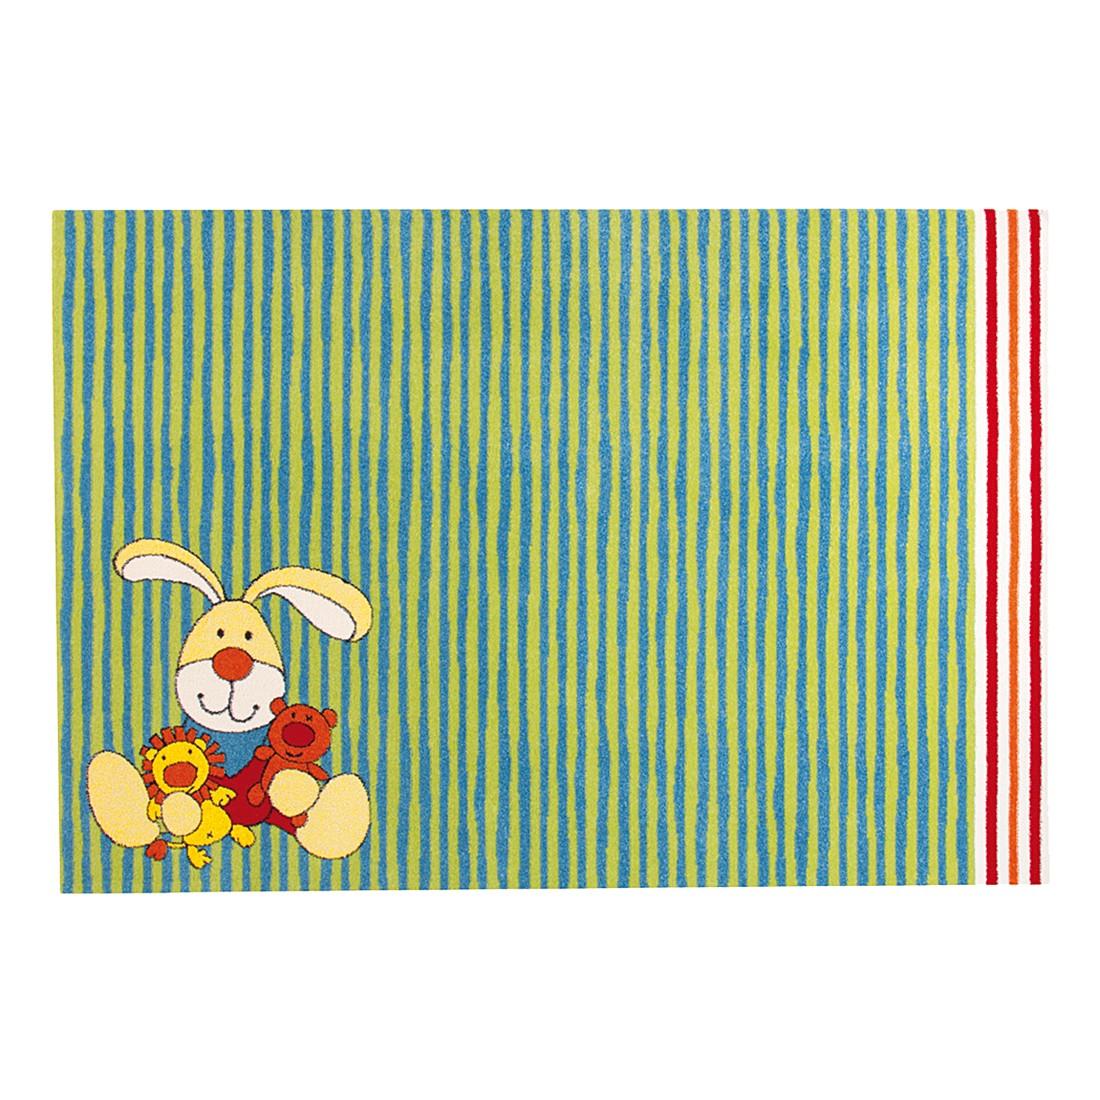 Kinderteppich Semmel Bunny - Grün - 80 x 150 cm, Sigikid